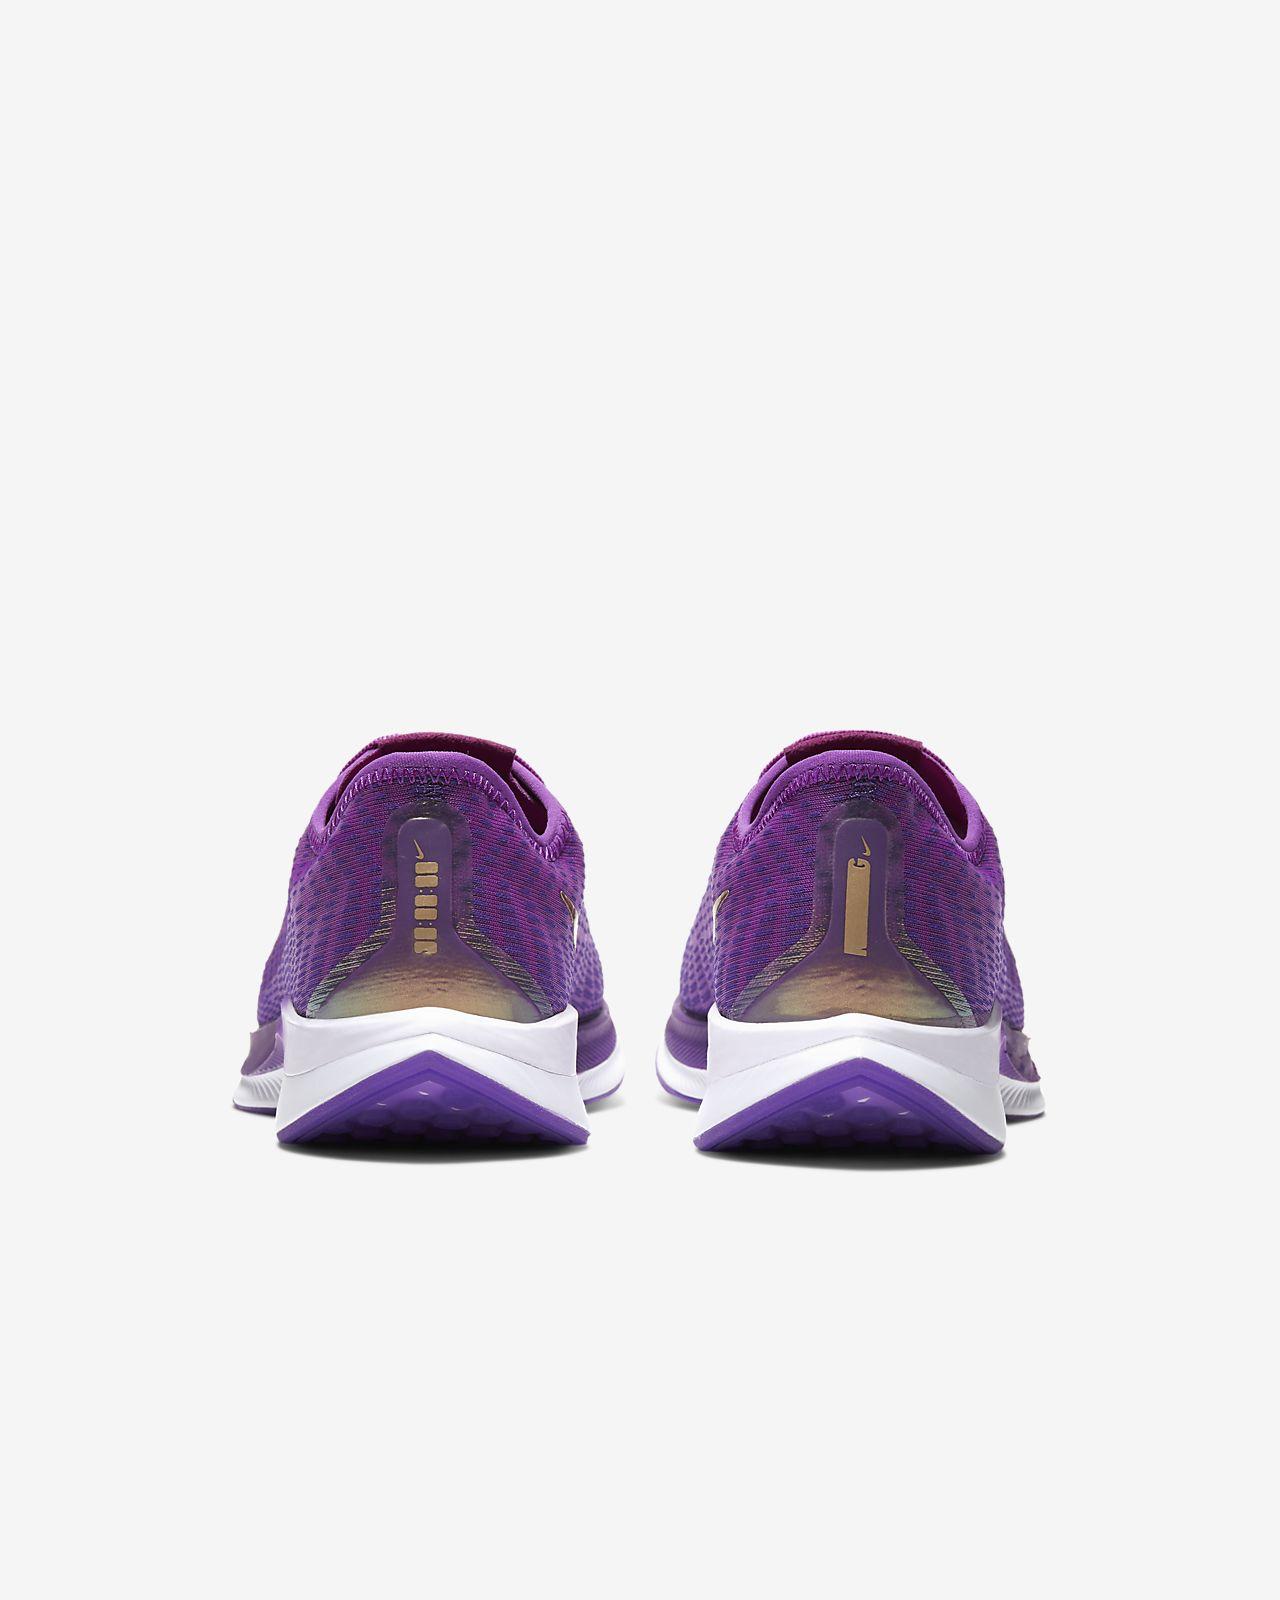 Damskie buty do biegania Nike Zoom Pegasus Turbo 2 Special Edition